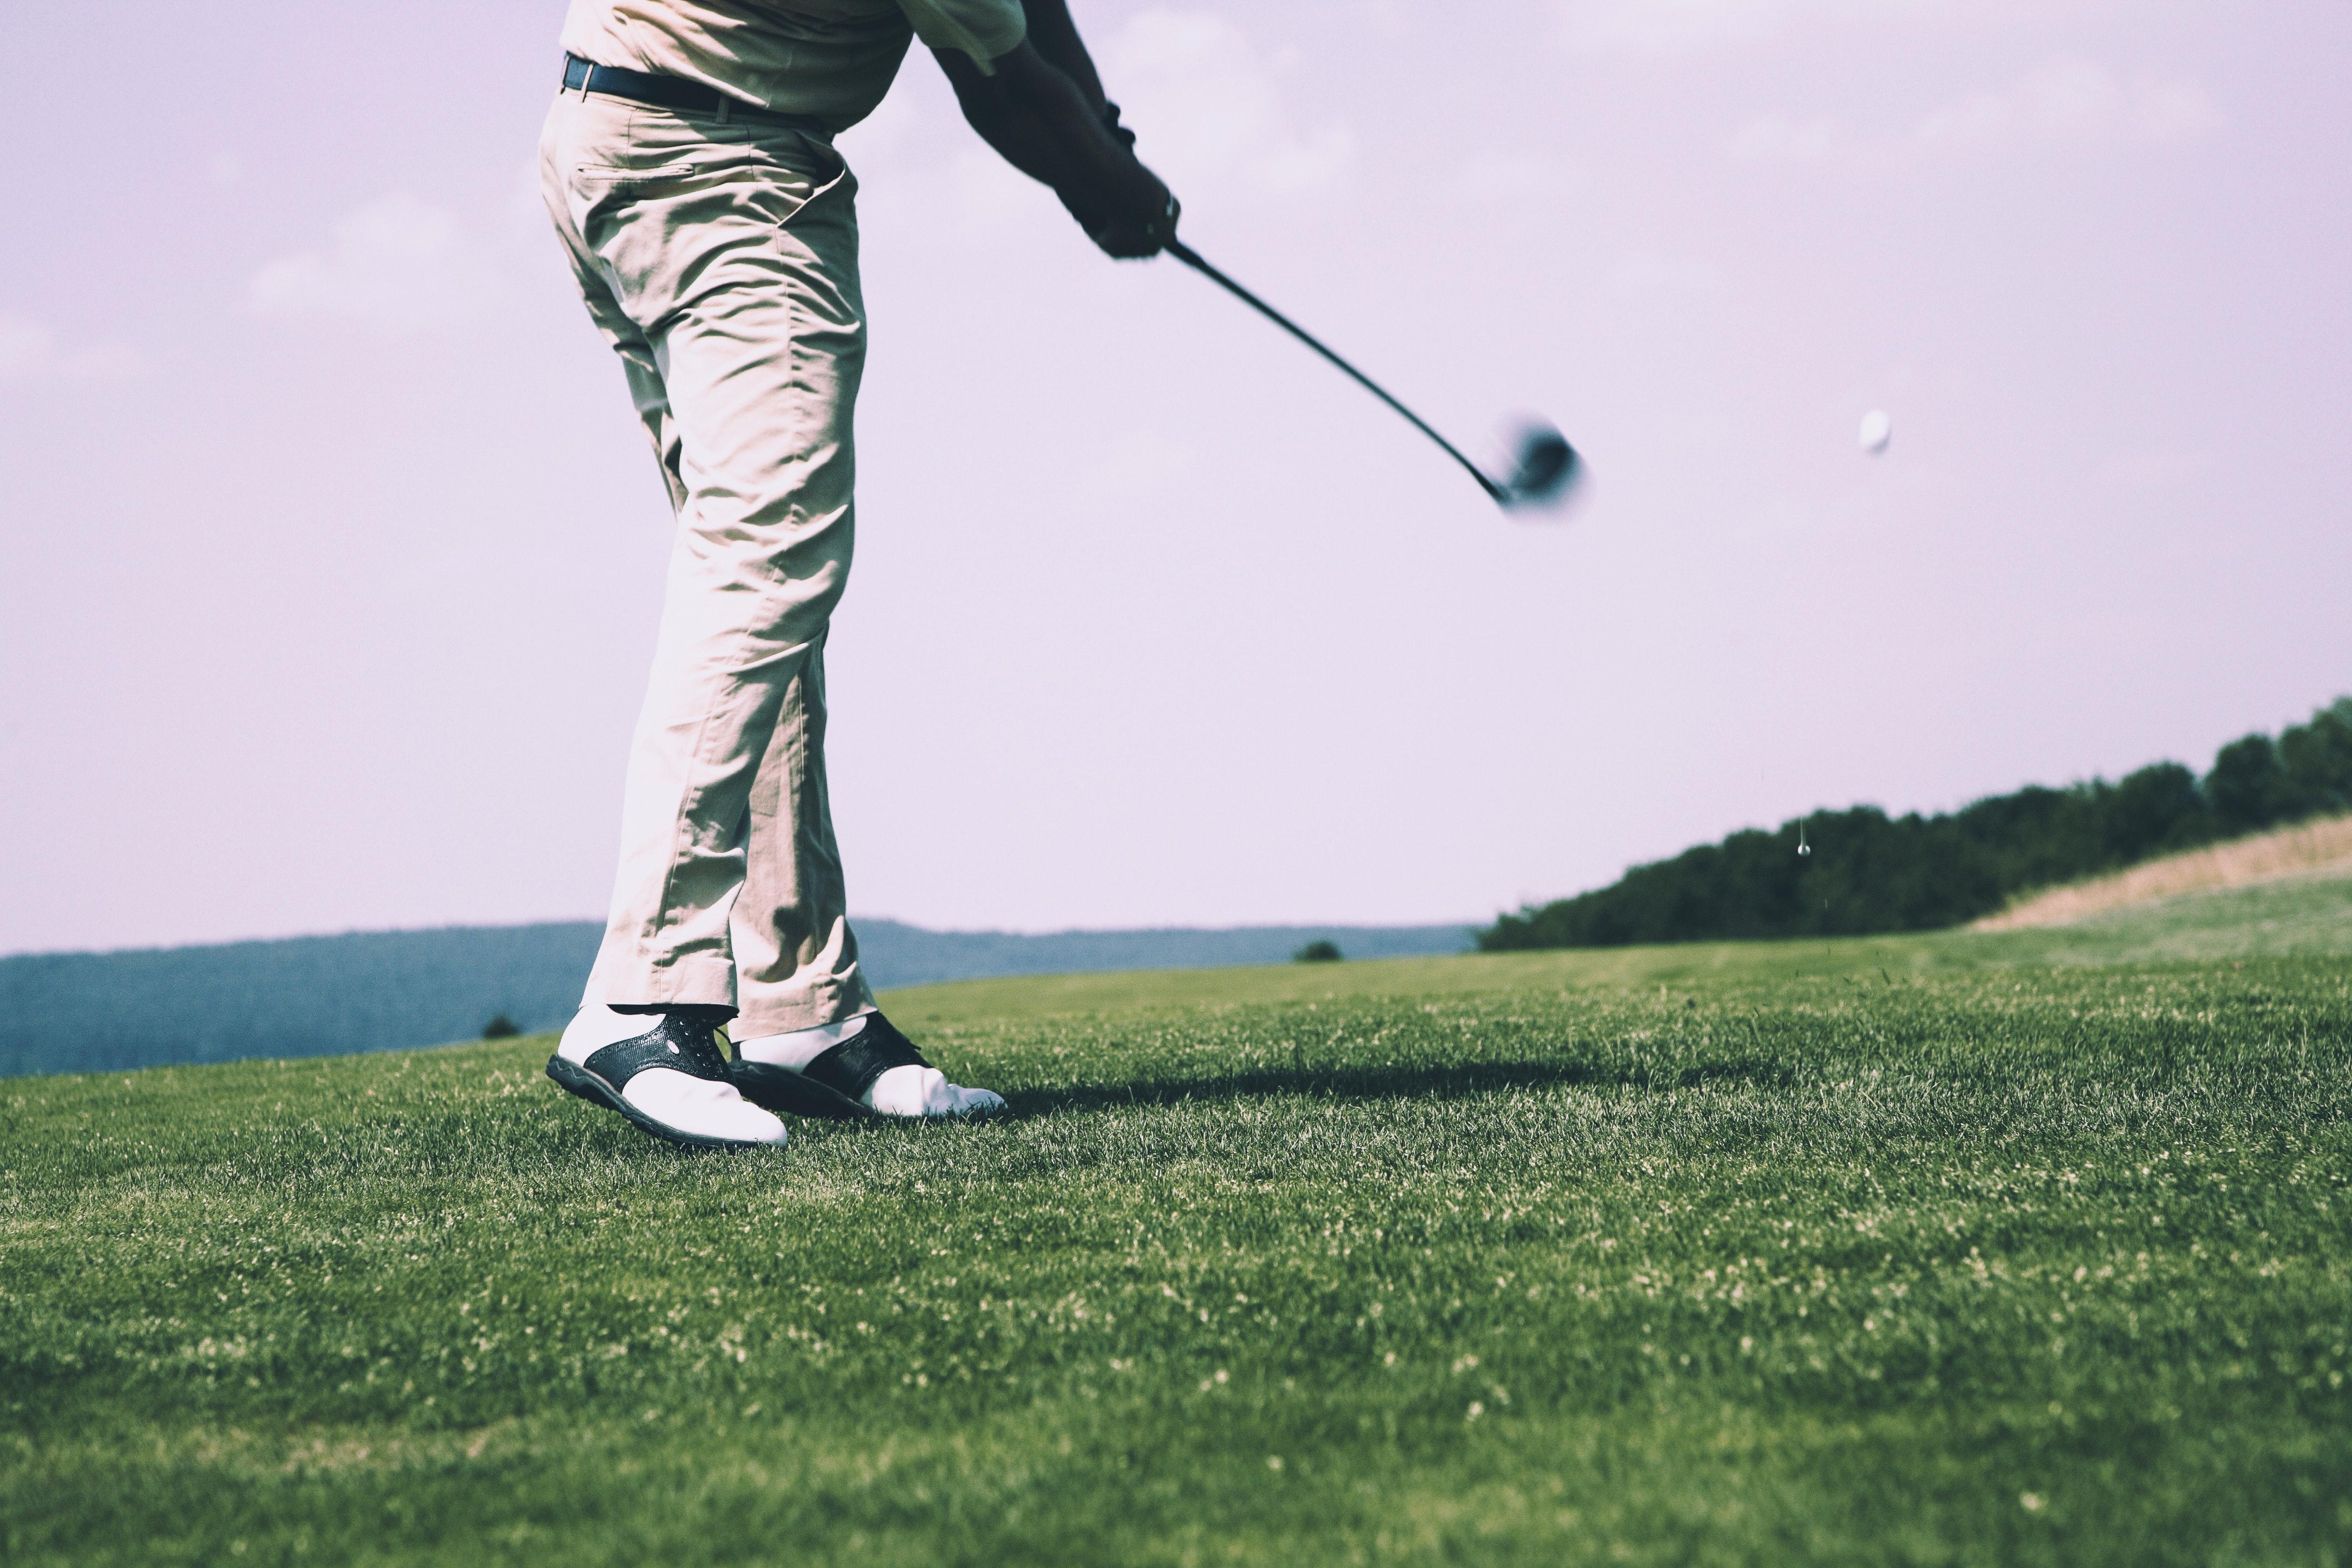 Is Marrakech good for golf?